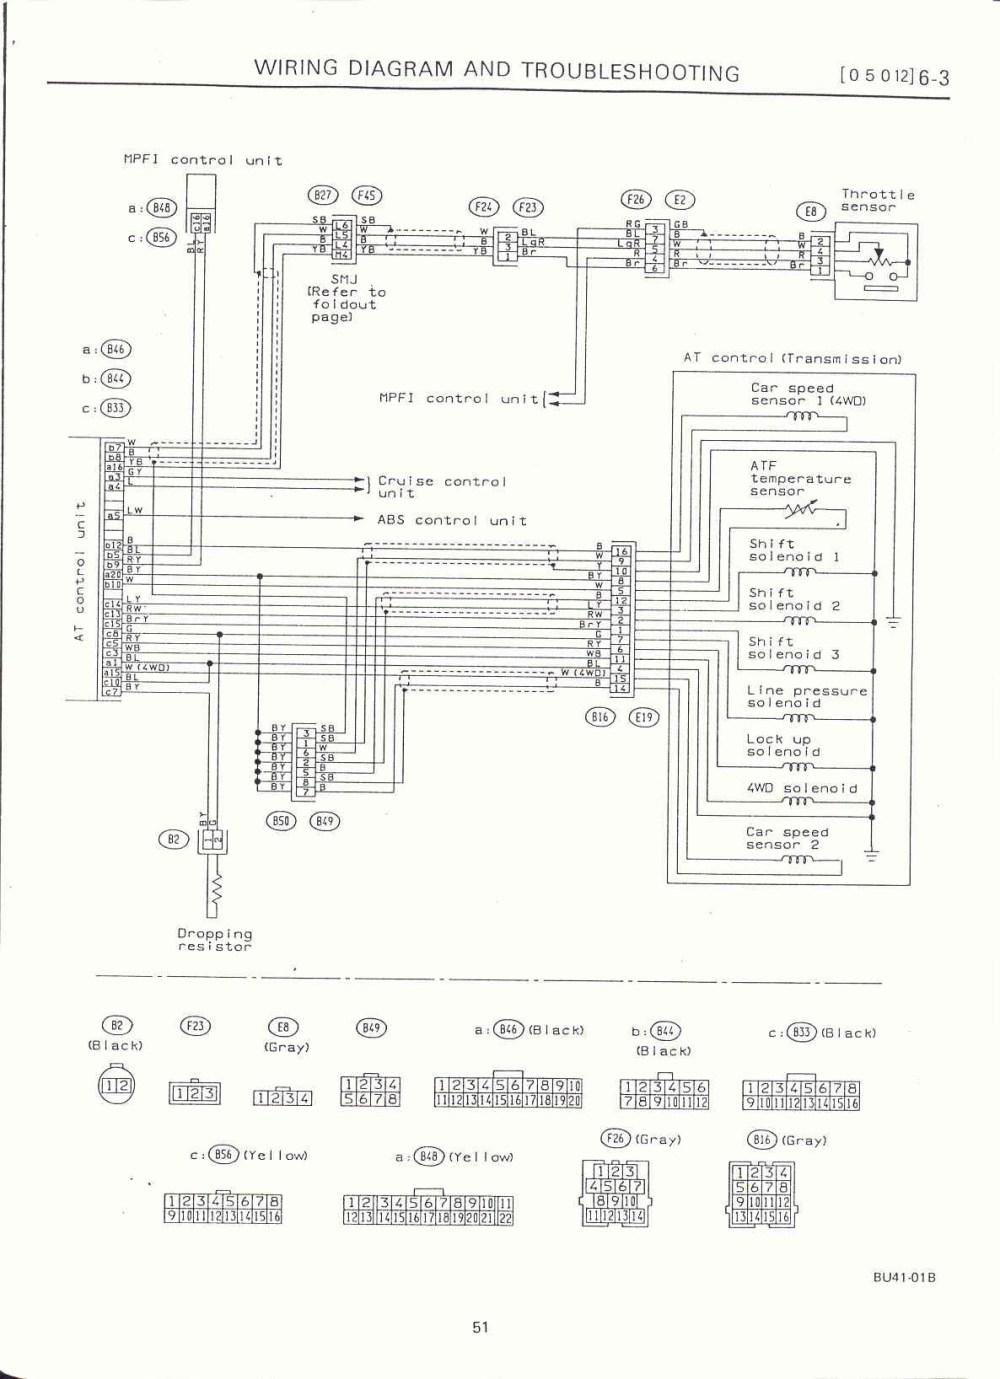 medium resolution of 2005 subaru forester engine diagram wiring library 2014 subaru forester 2 5xt subaru engine diagram